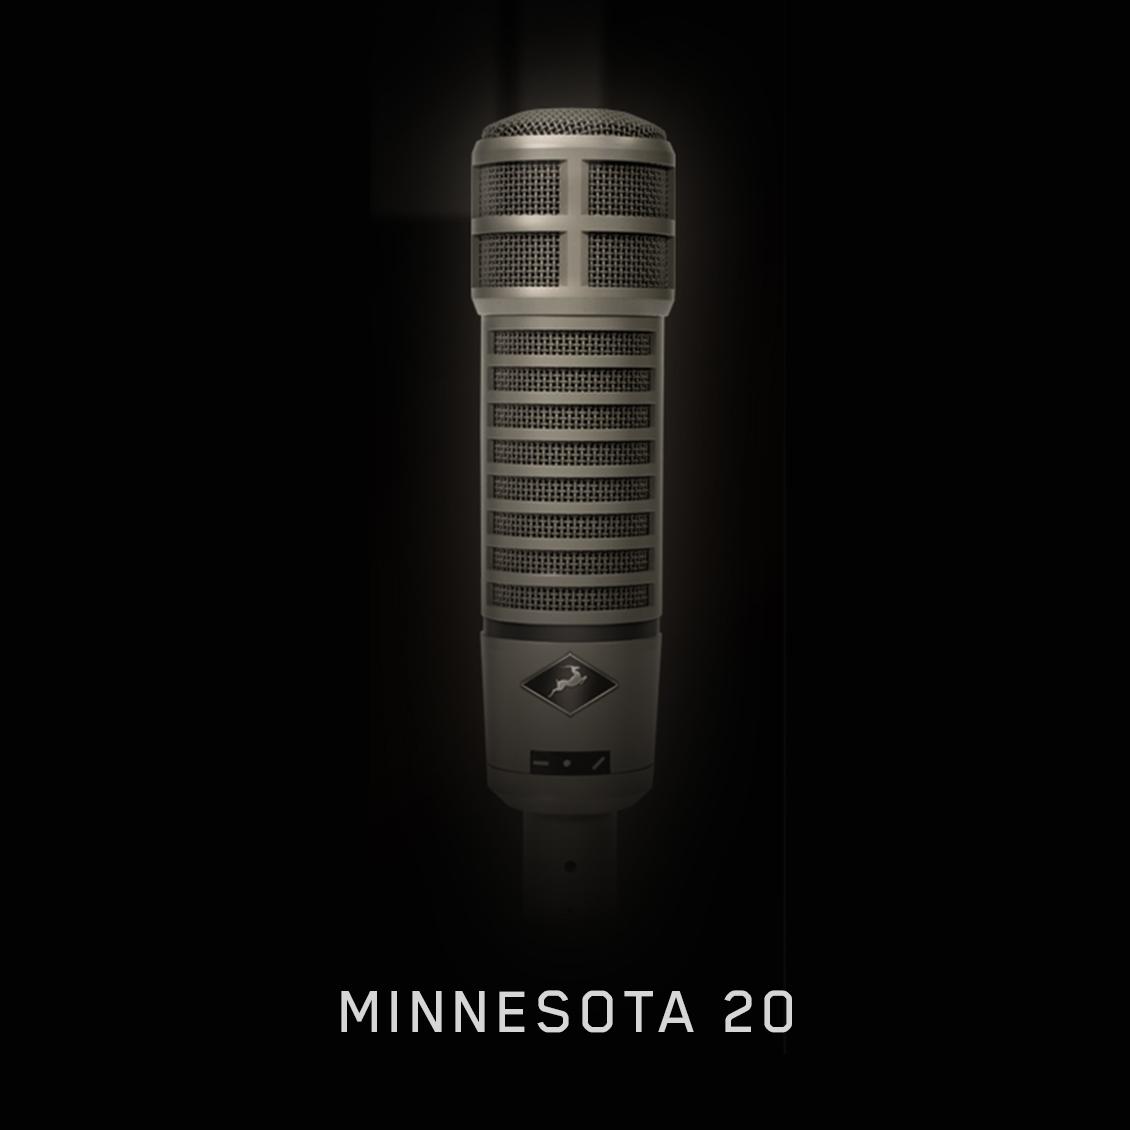 Minnesota 20